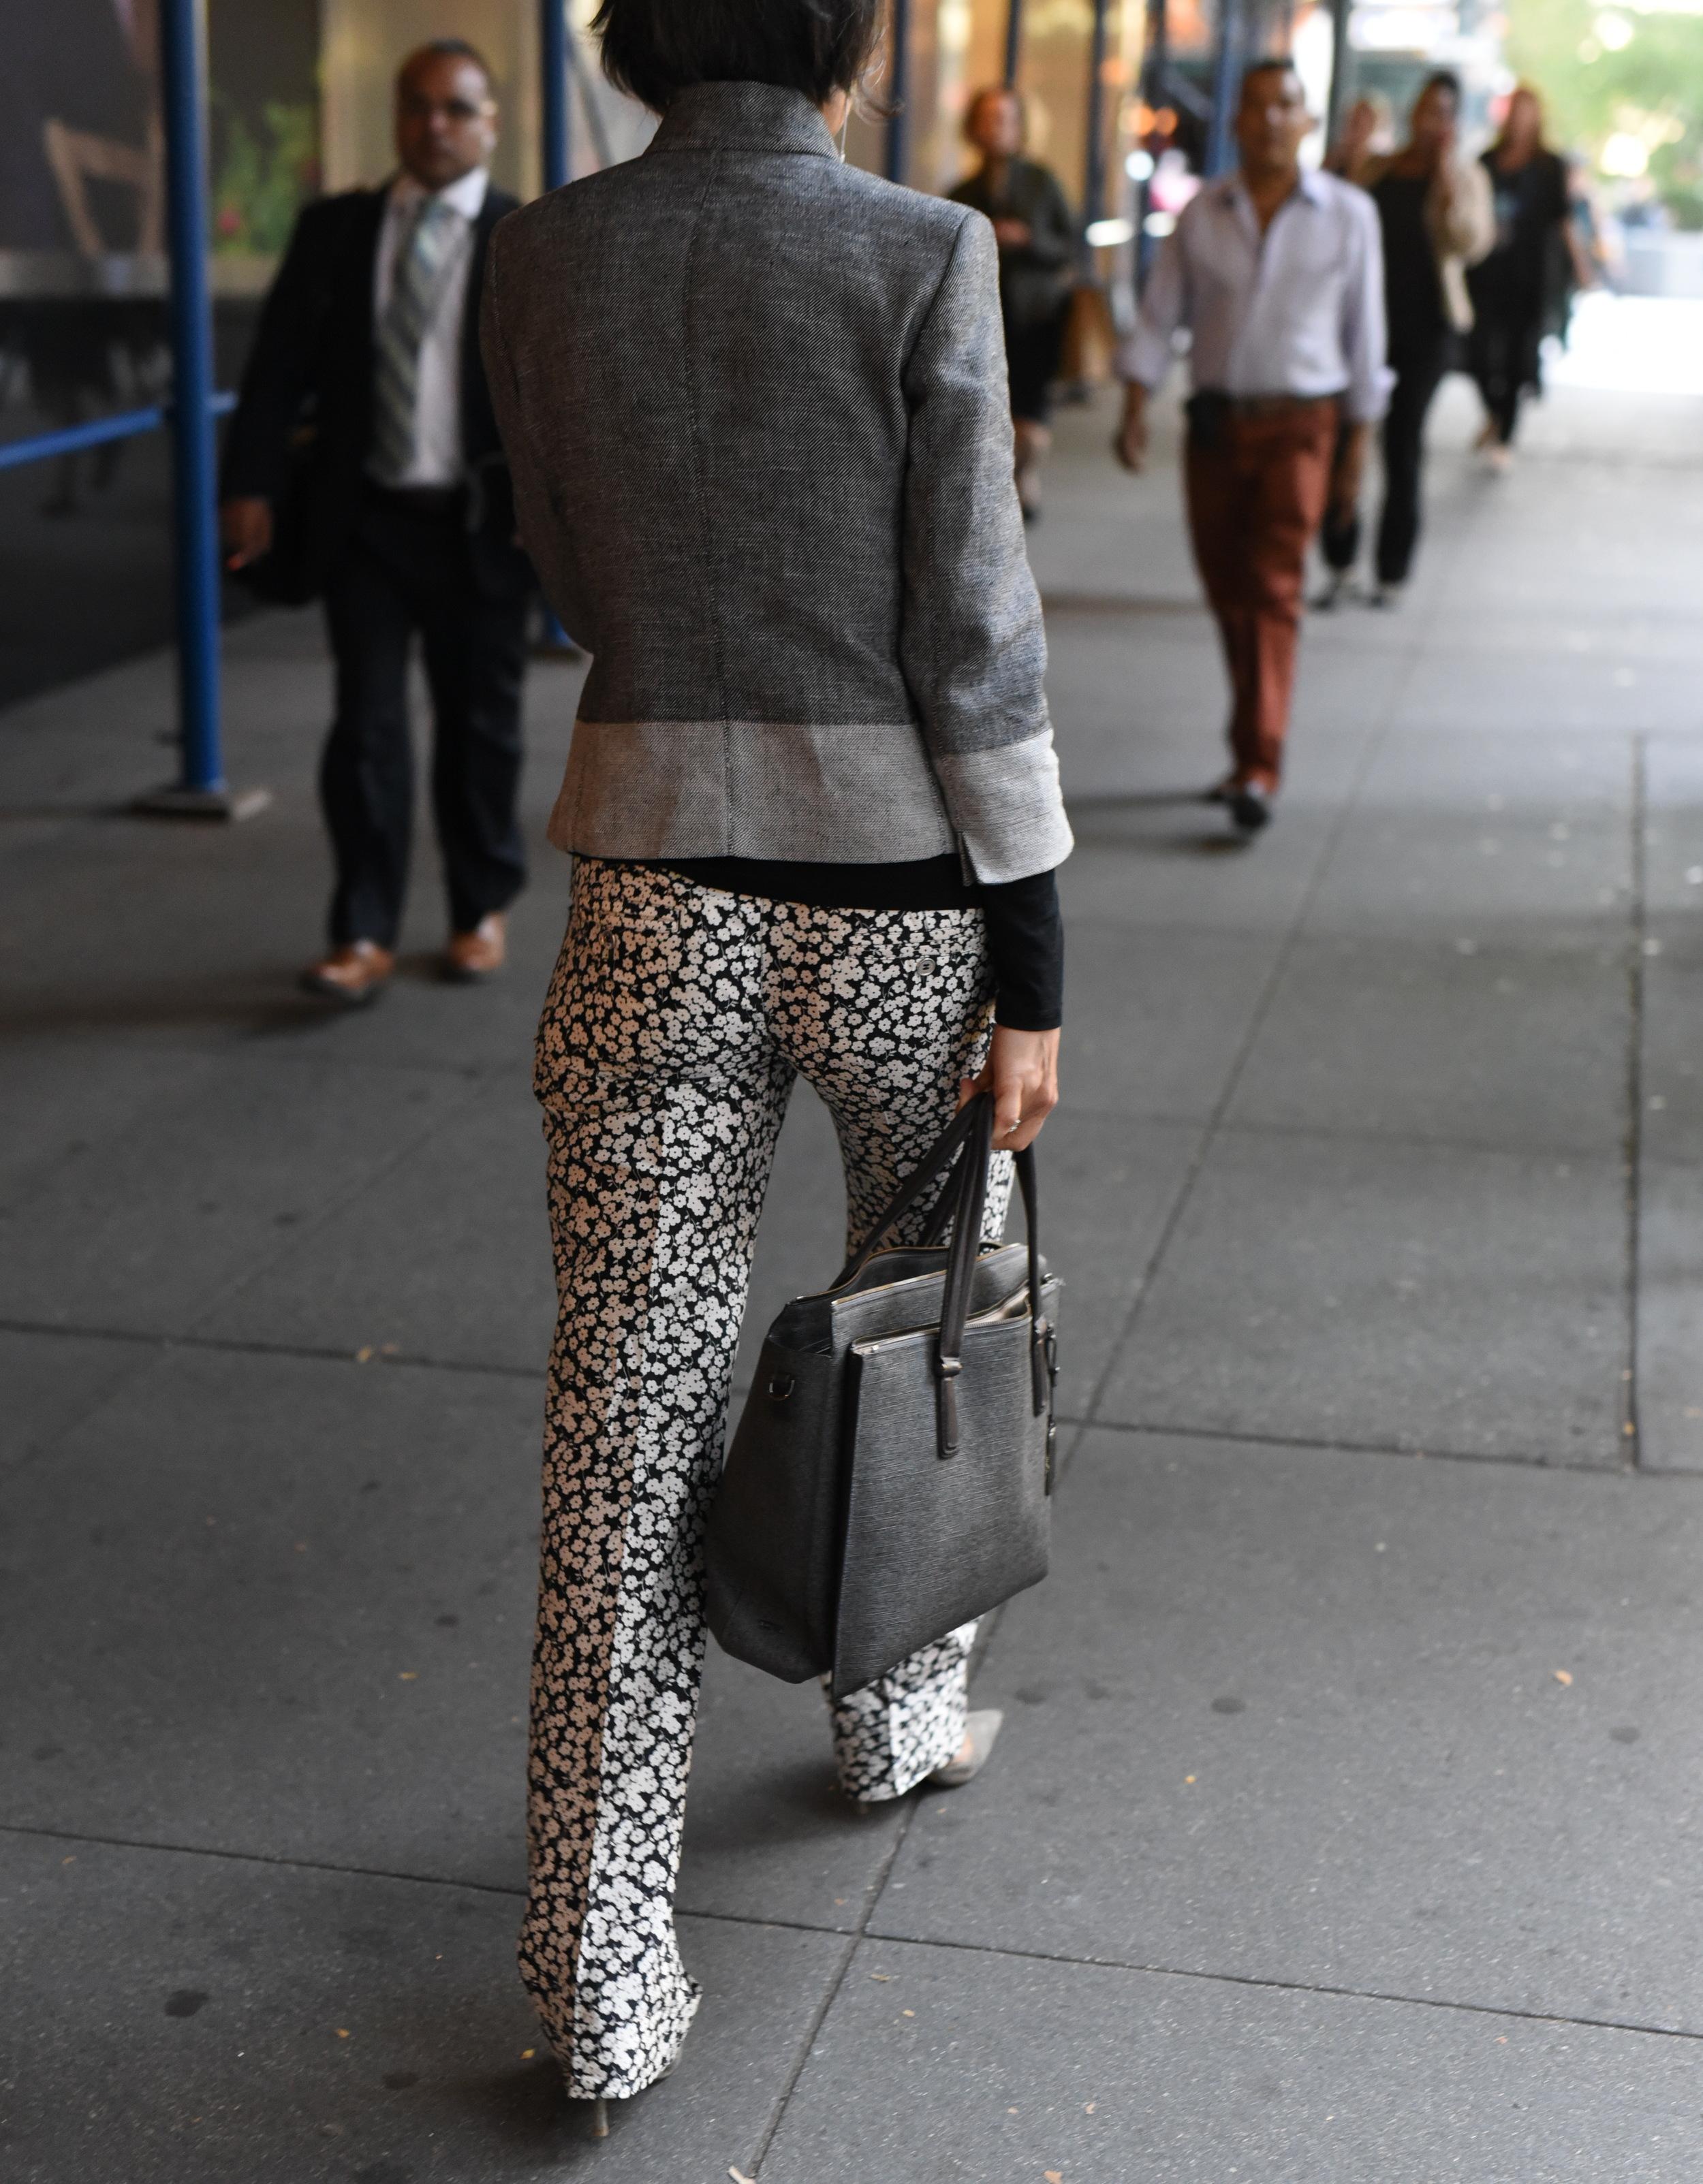 lady-in-new-york.jpg